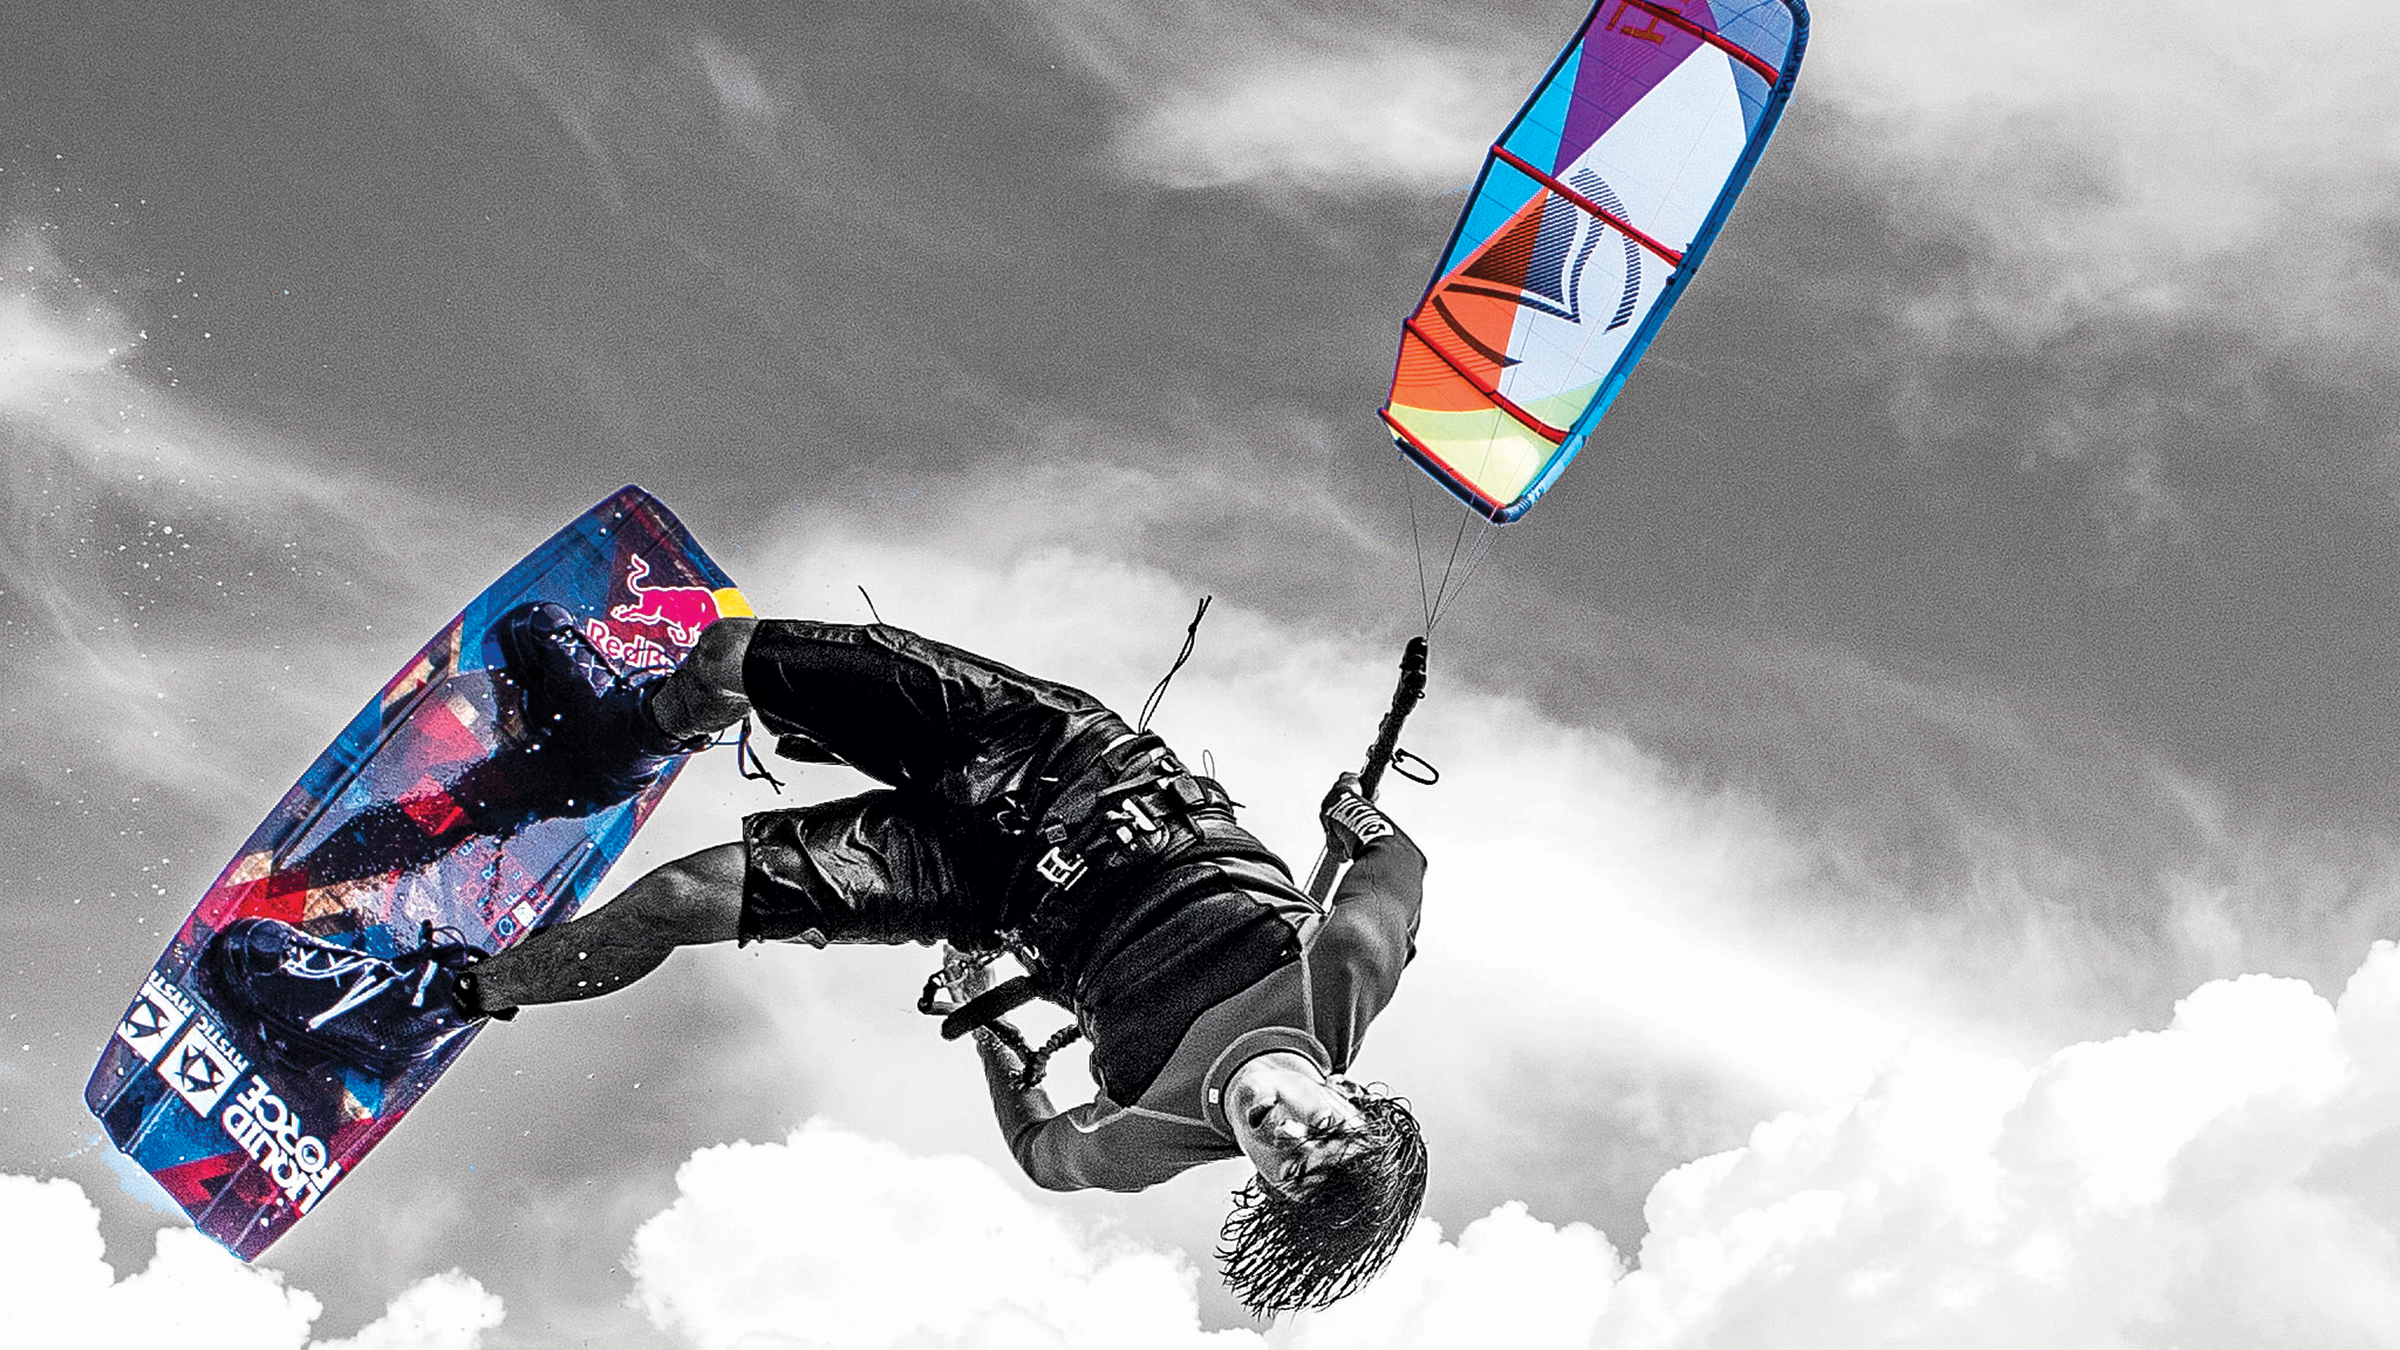 Download Wake style kiteboarding wallpaper Cristophe Tack 2400x1350